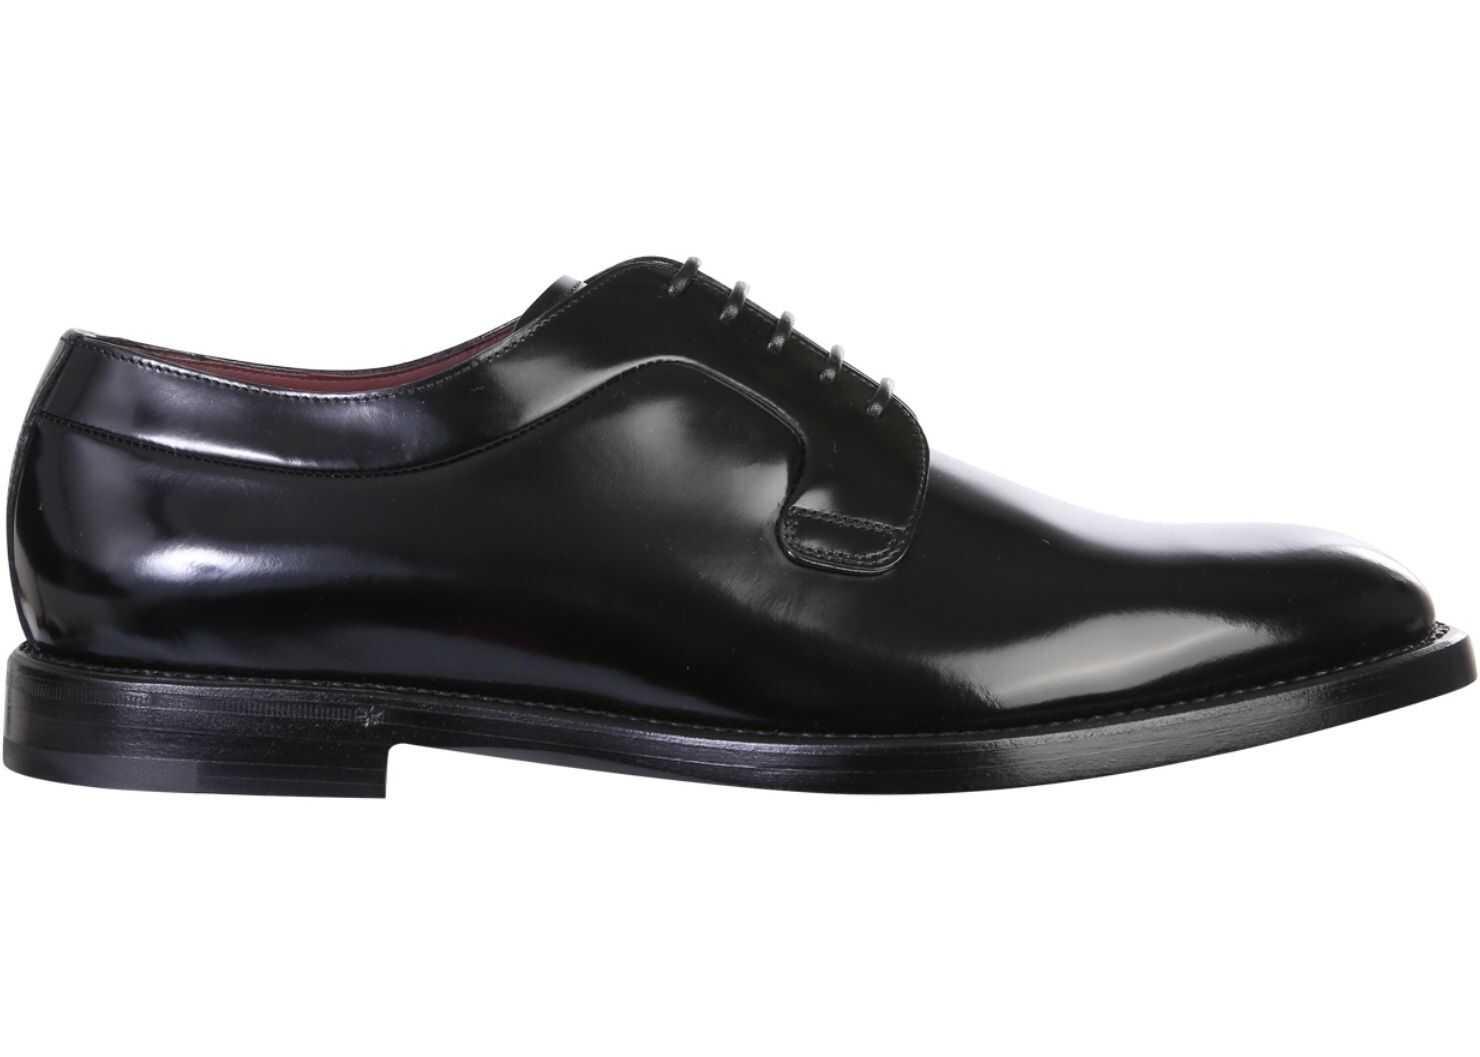 Dolce & Gabbana Derby Shoes A10650_A120380999 BLACK imagine b-mall.ro